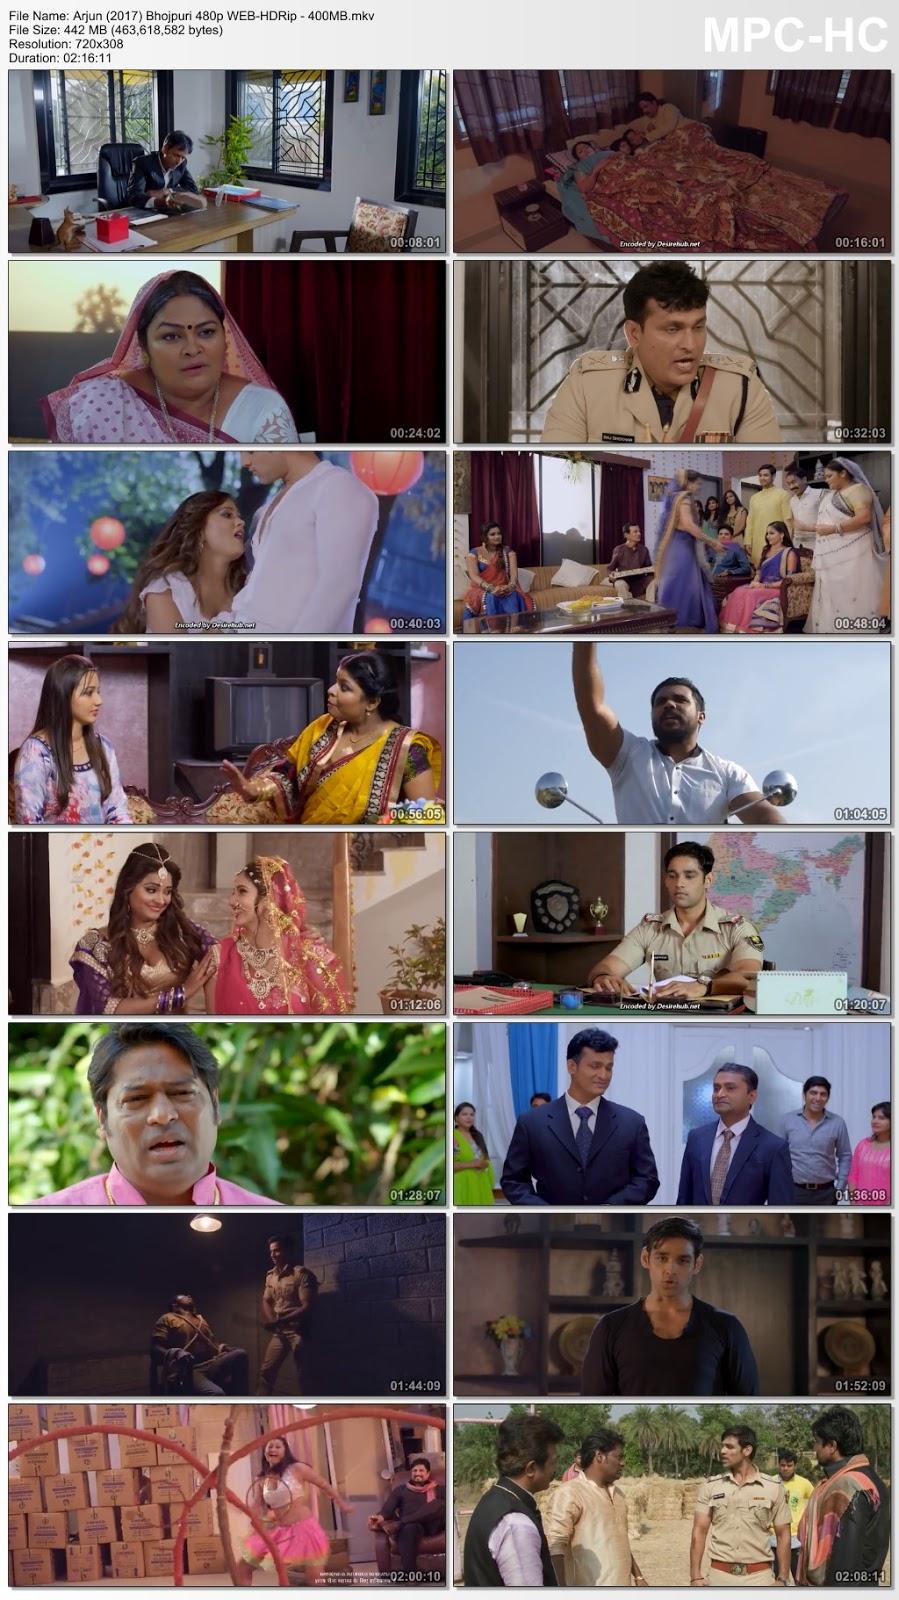 Arjun (2017) Bhojpuri 480p WEB-HDRip – 400MB Desirehub